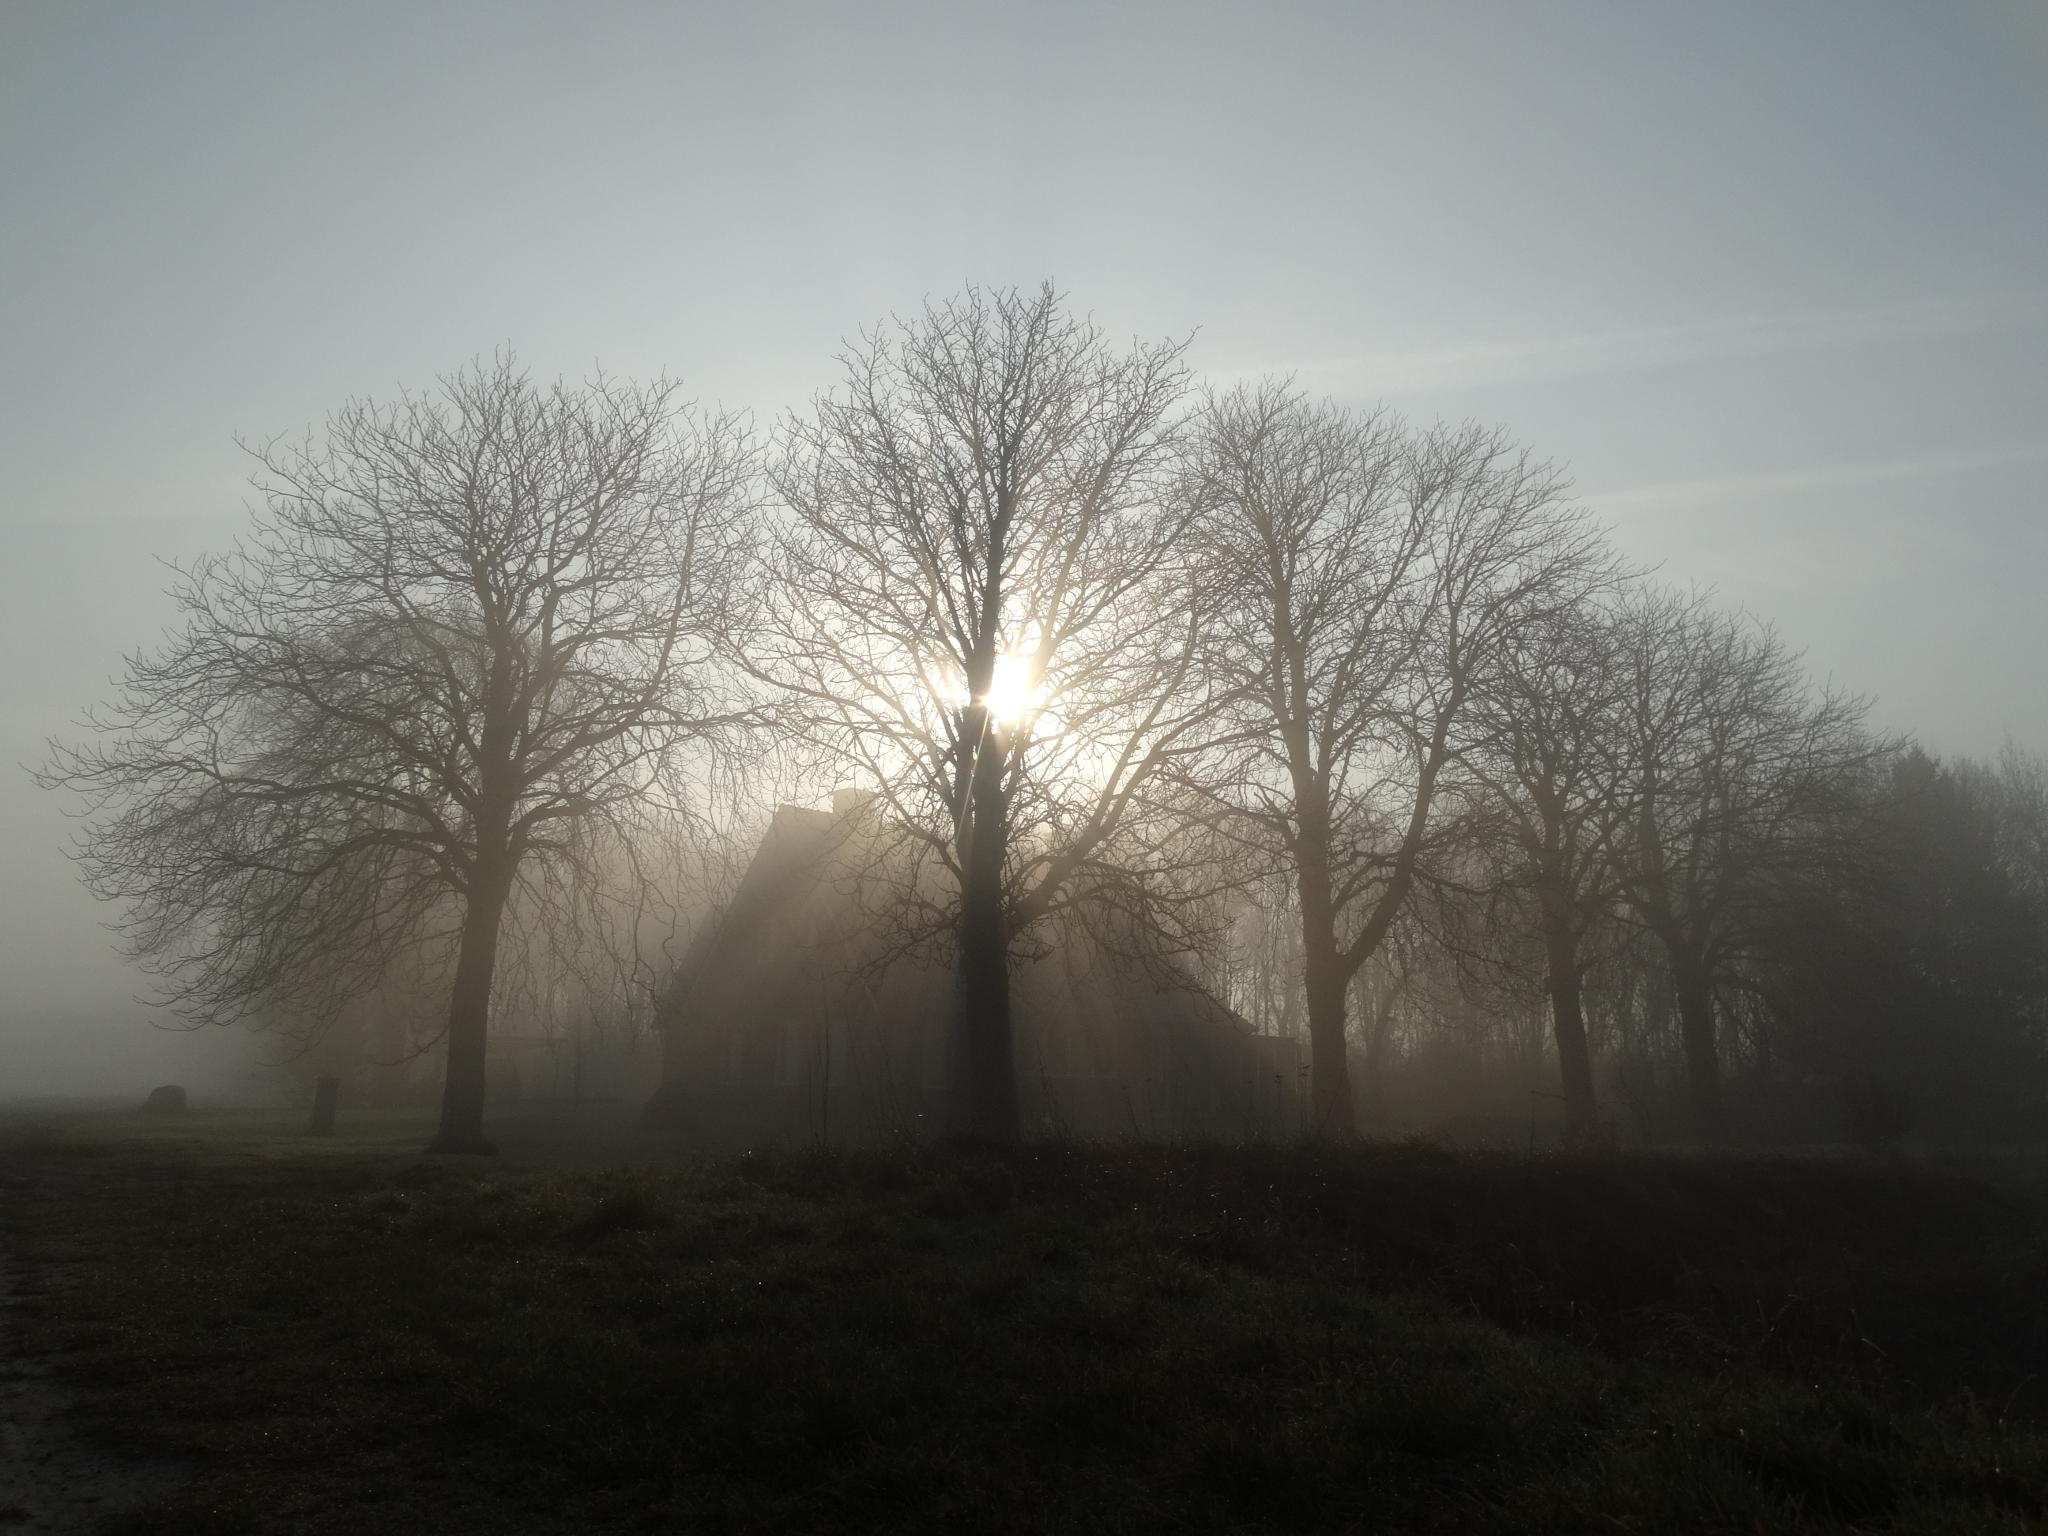 Spooky house in the fog!  by GertdeVos